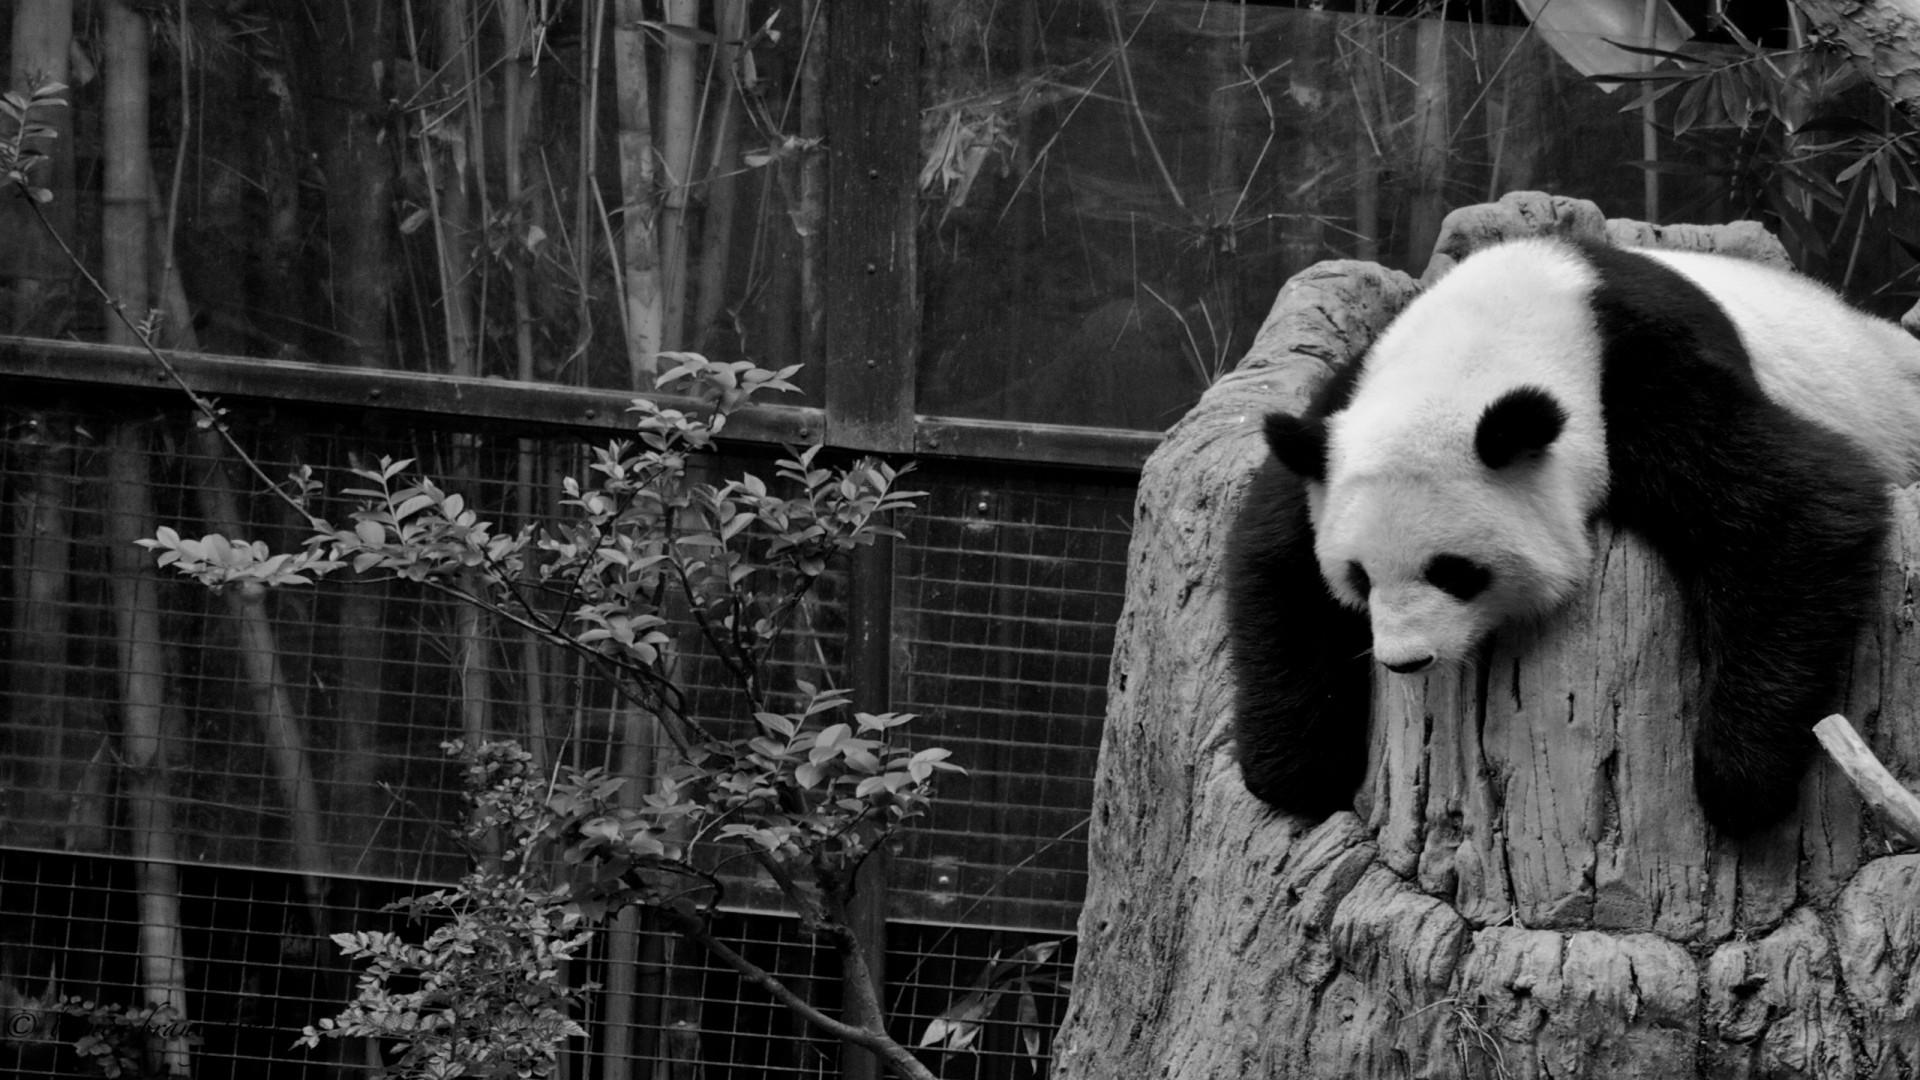 Wallpaper panda, sleep, nature reserve, hollow, black white